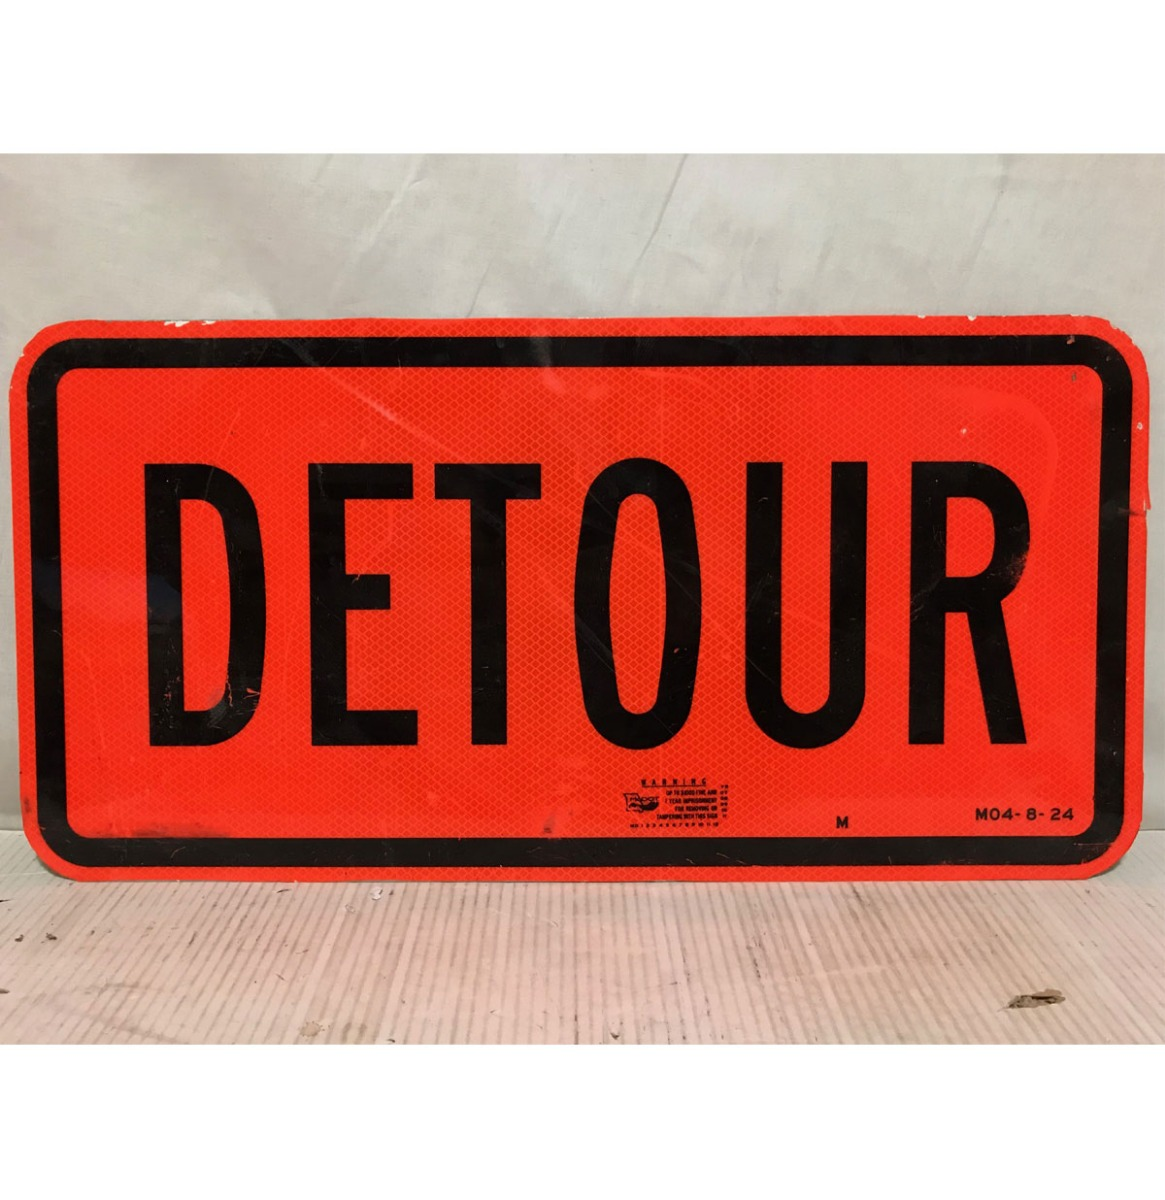 Detour Origineel Street Sign